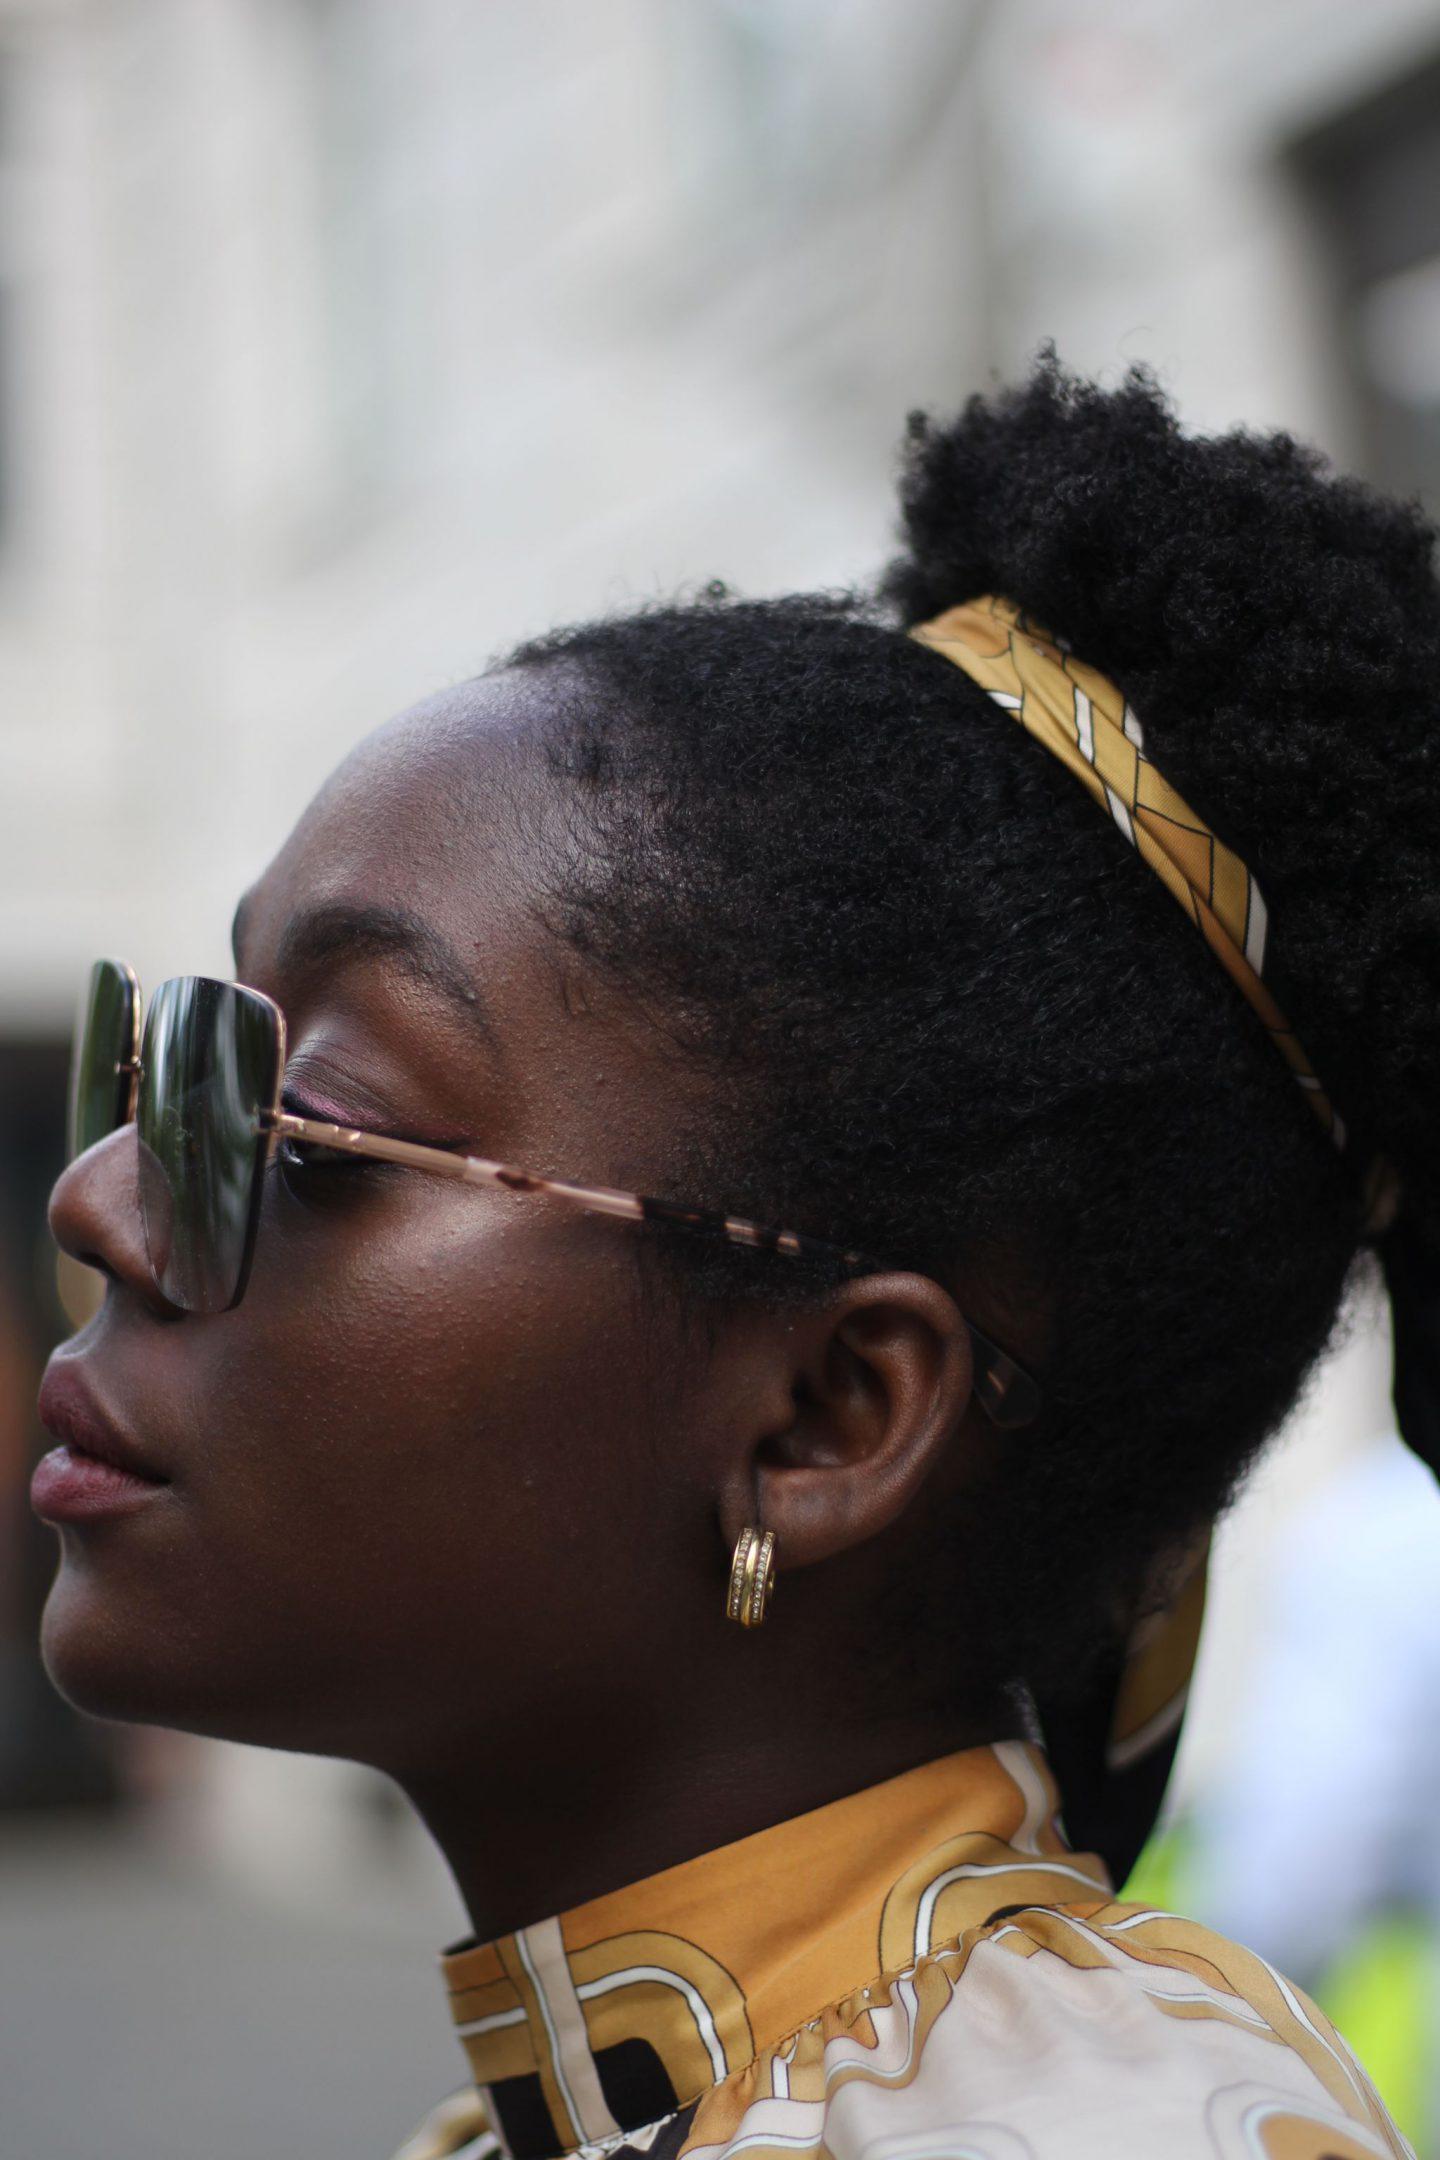 afro_hair_styles_natural_hair_Richard_Allan_HM_Lois_Opoku_streetstyle_lisforlois_1